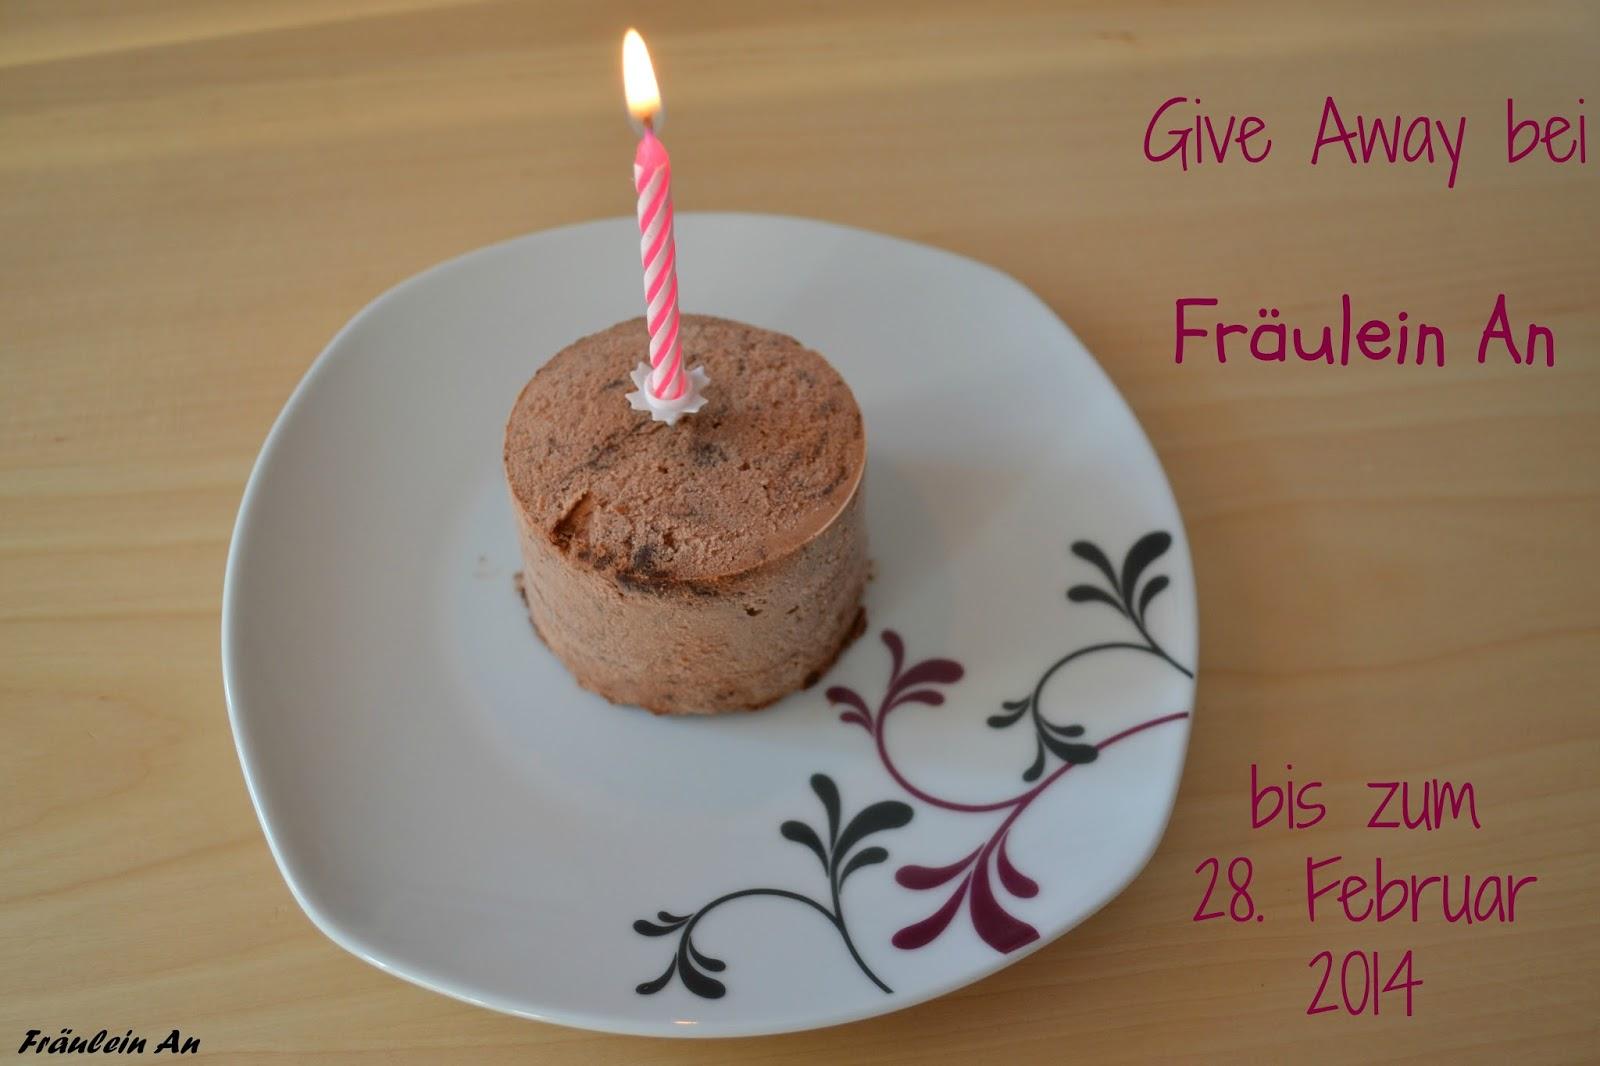 http://fraeuleinan.blogspot.de/2014/01/happy-birthday-fraulein-an.html